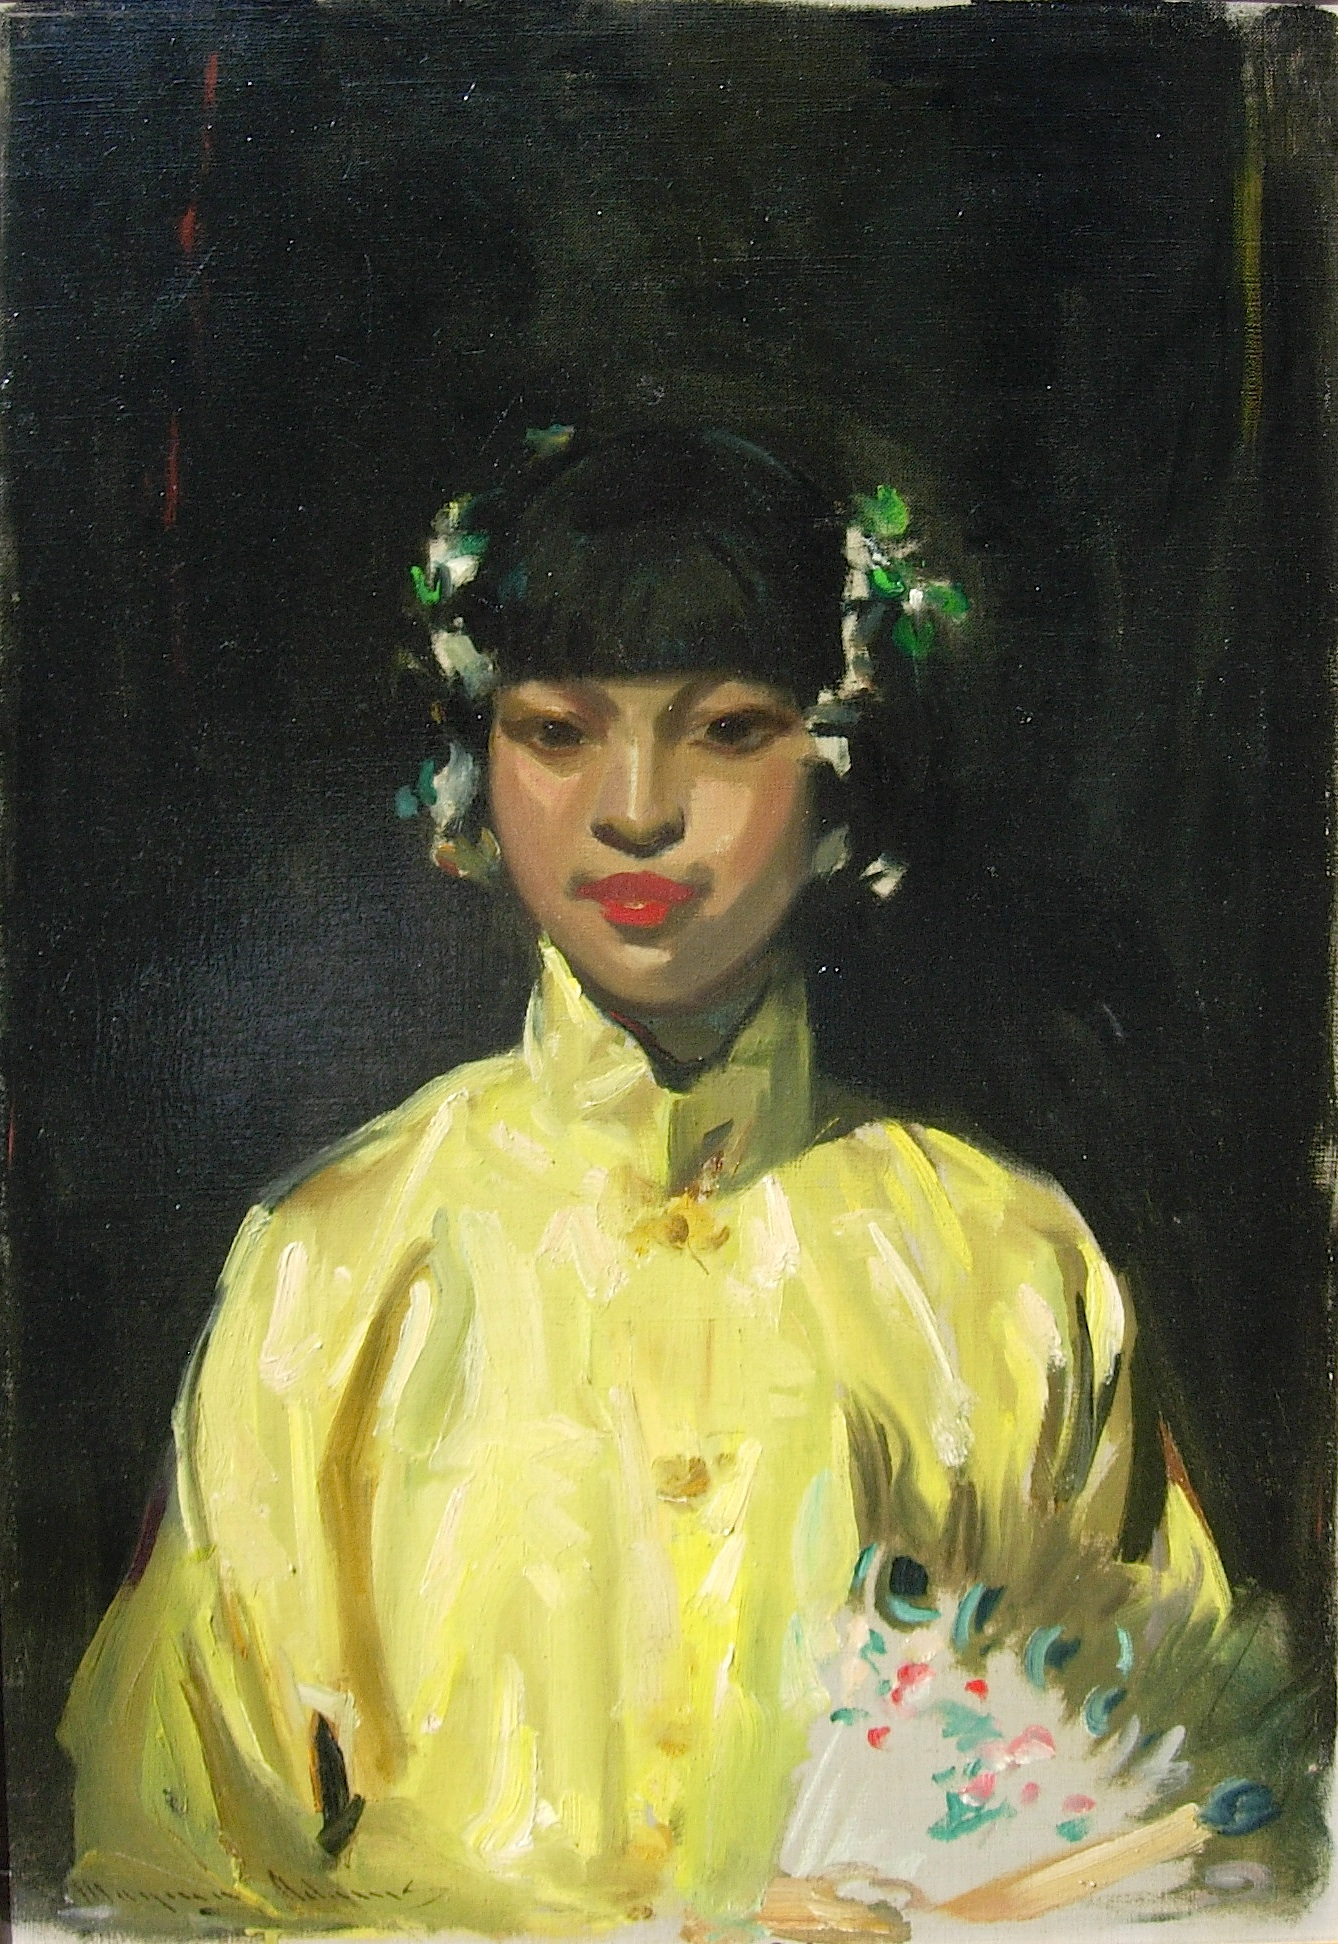 wadams-orientalgirl-cropped